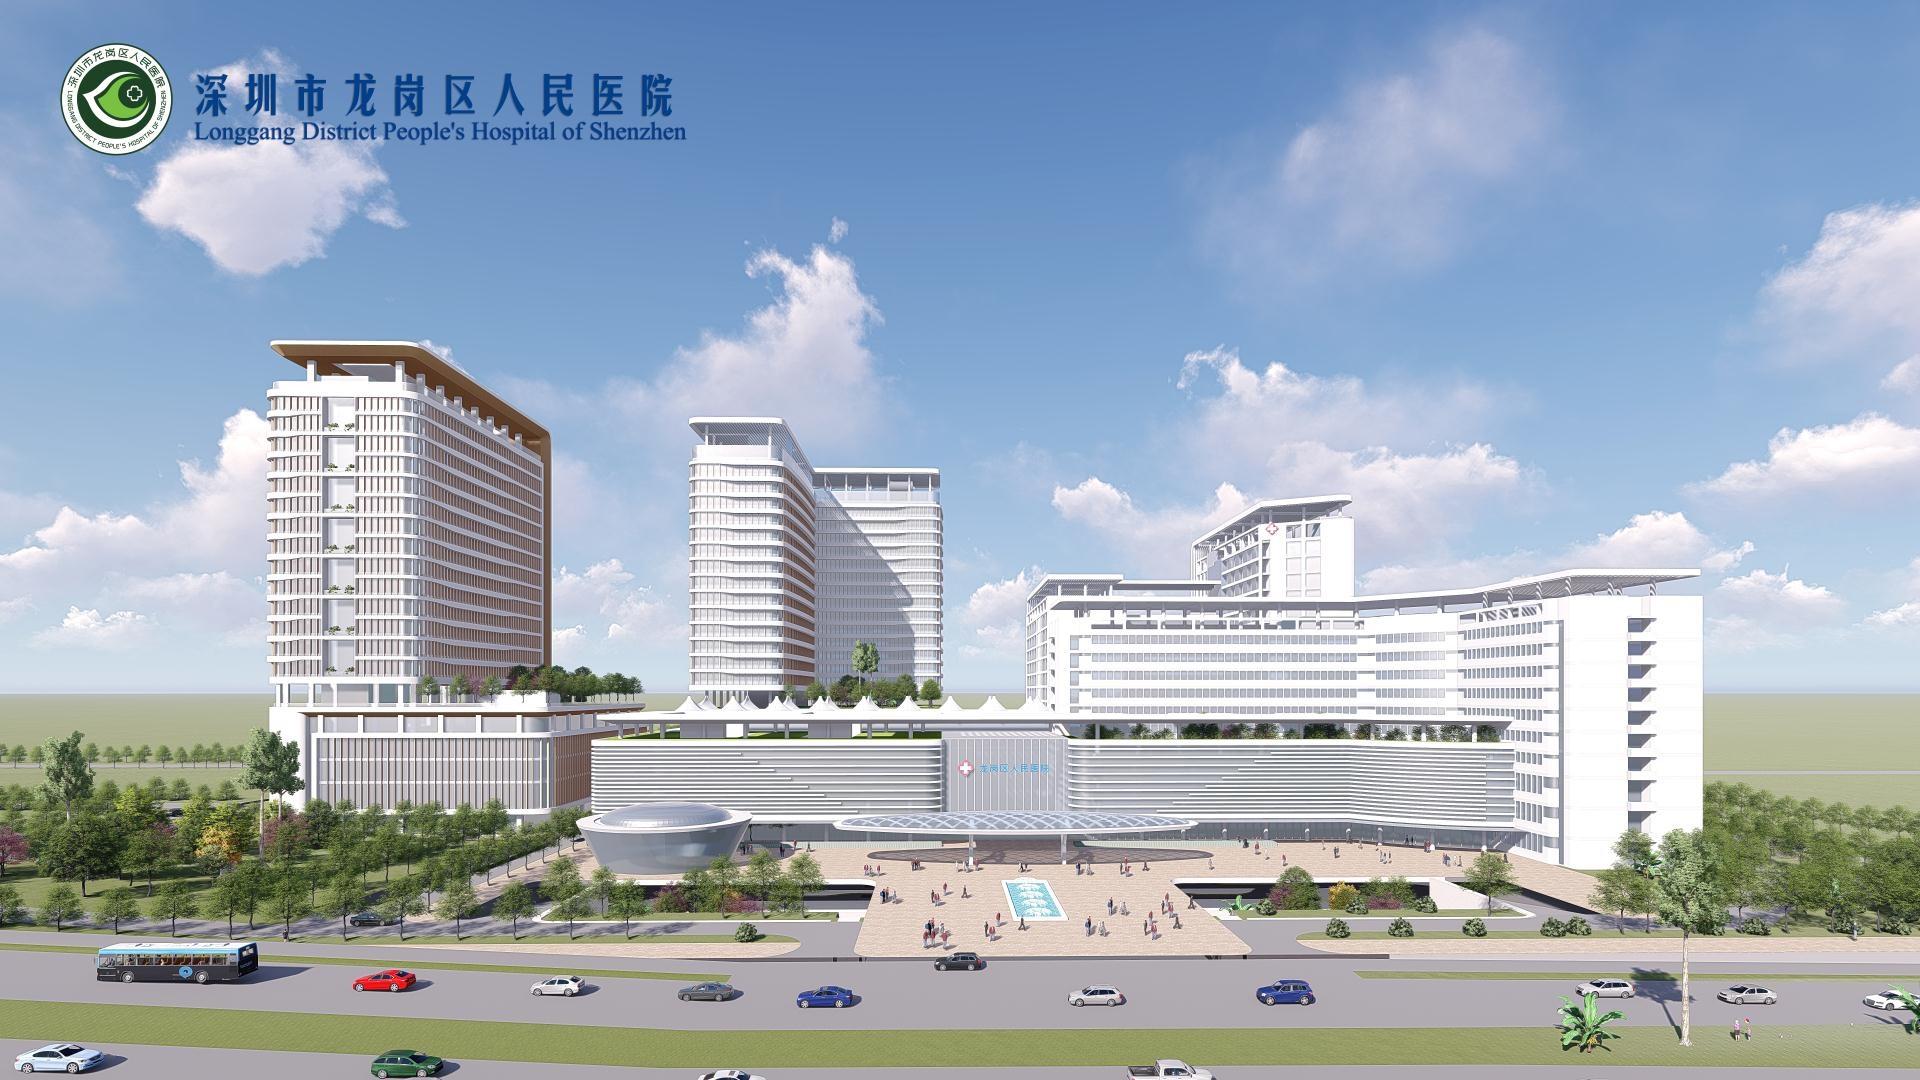 Hospital of Shenzhen buildings